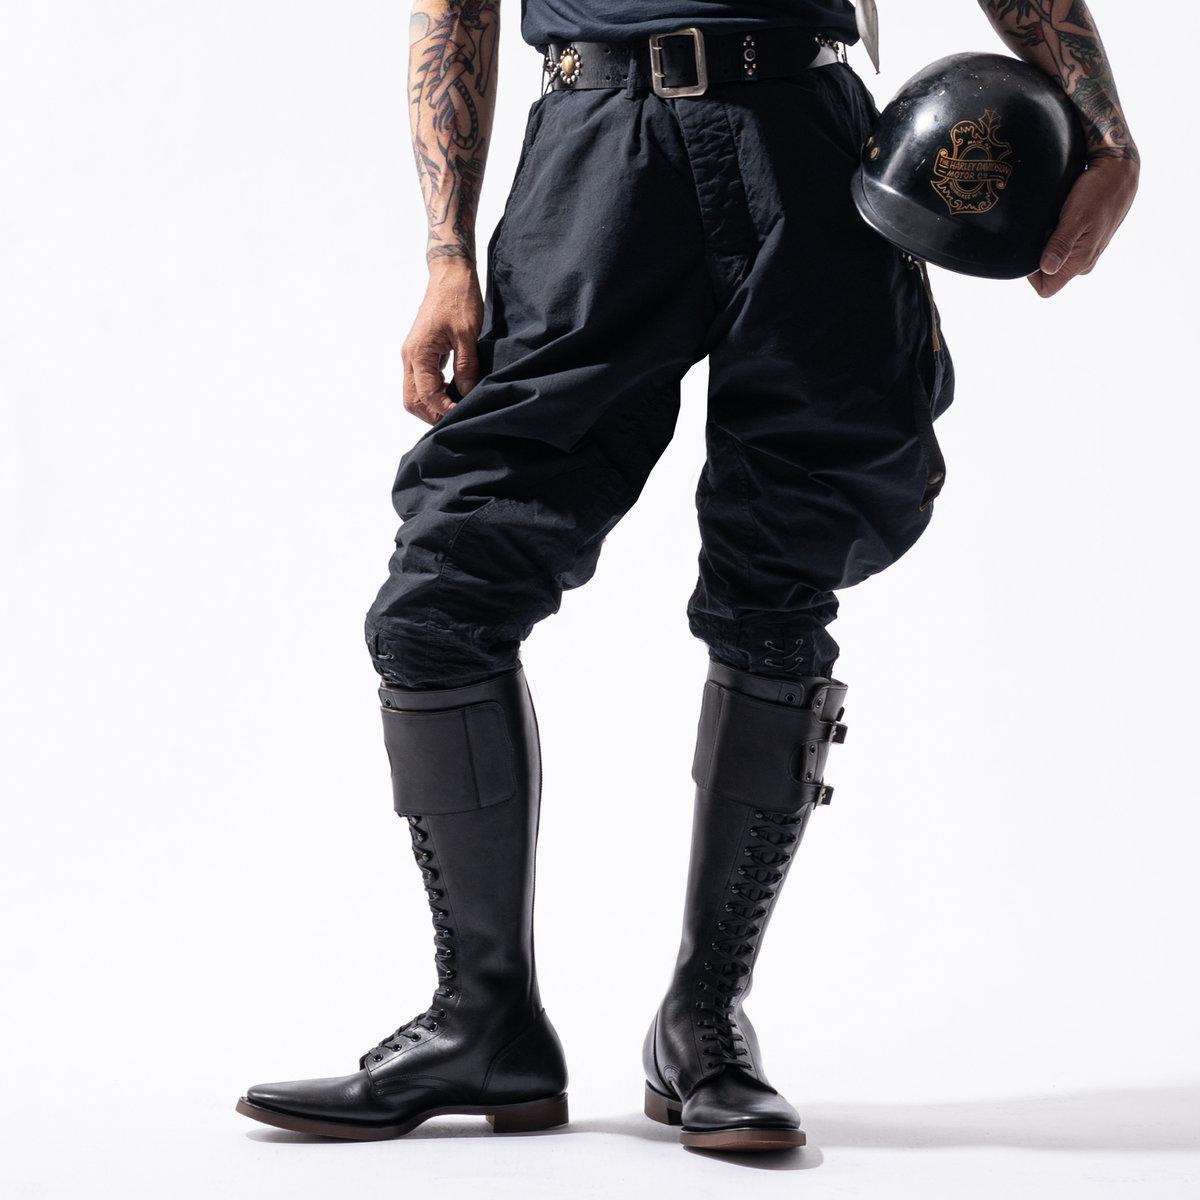 BS x Clinch - Transcontinental Boots - Onbody-02.jpg